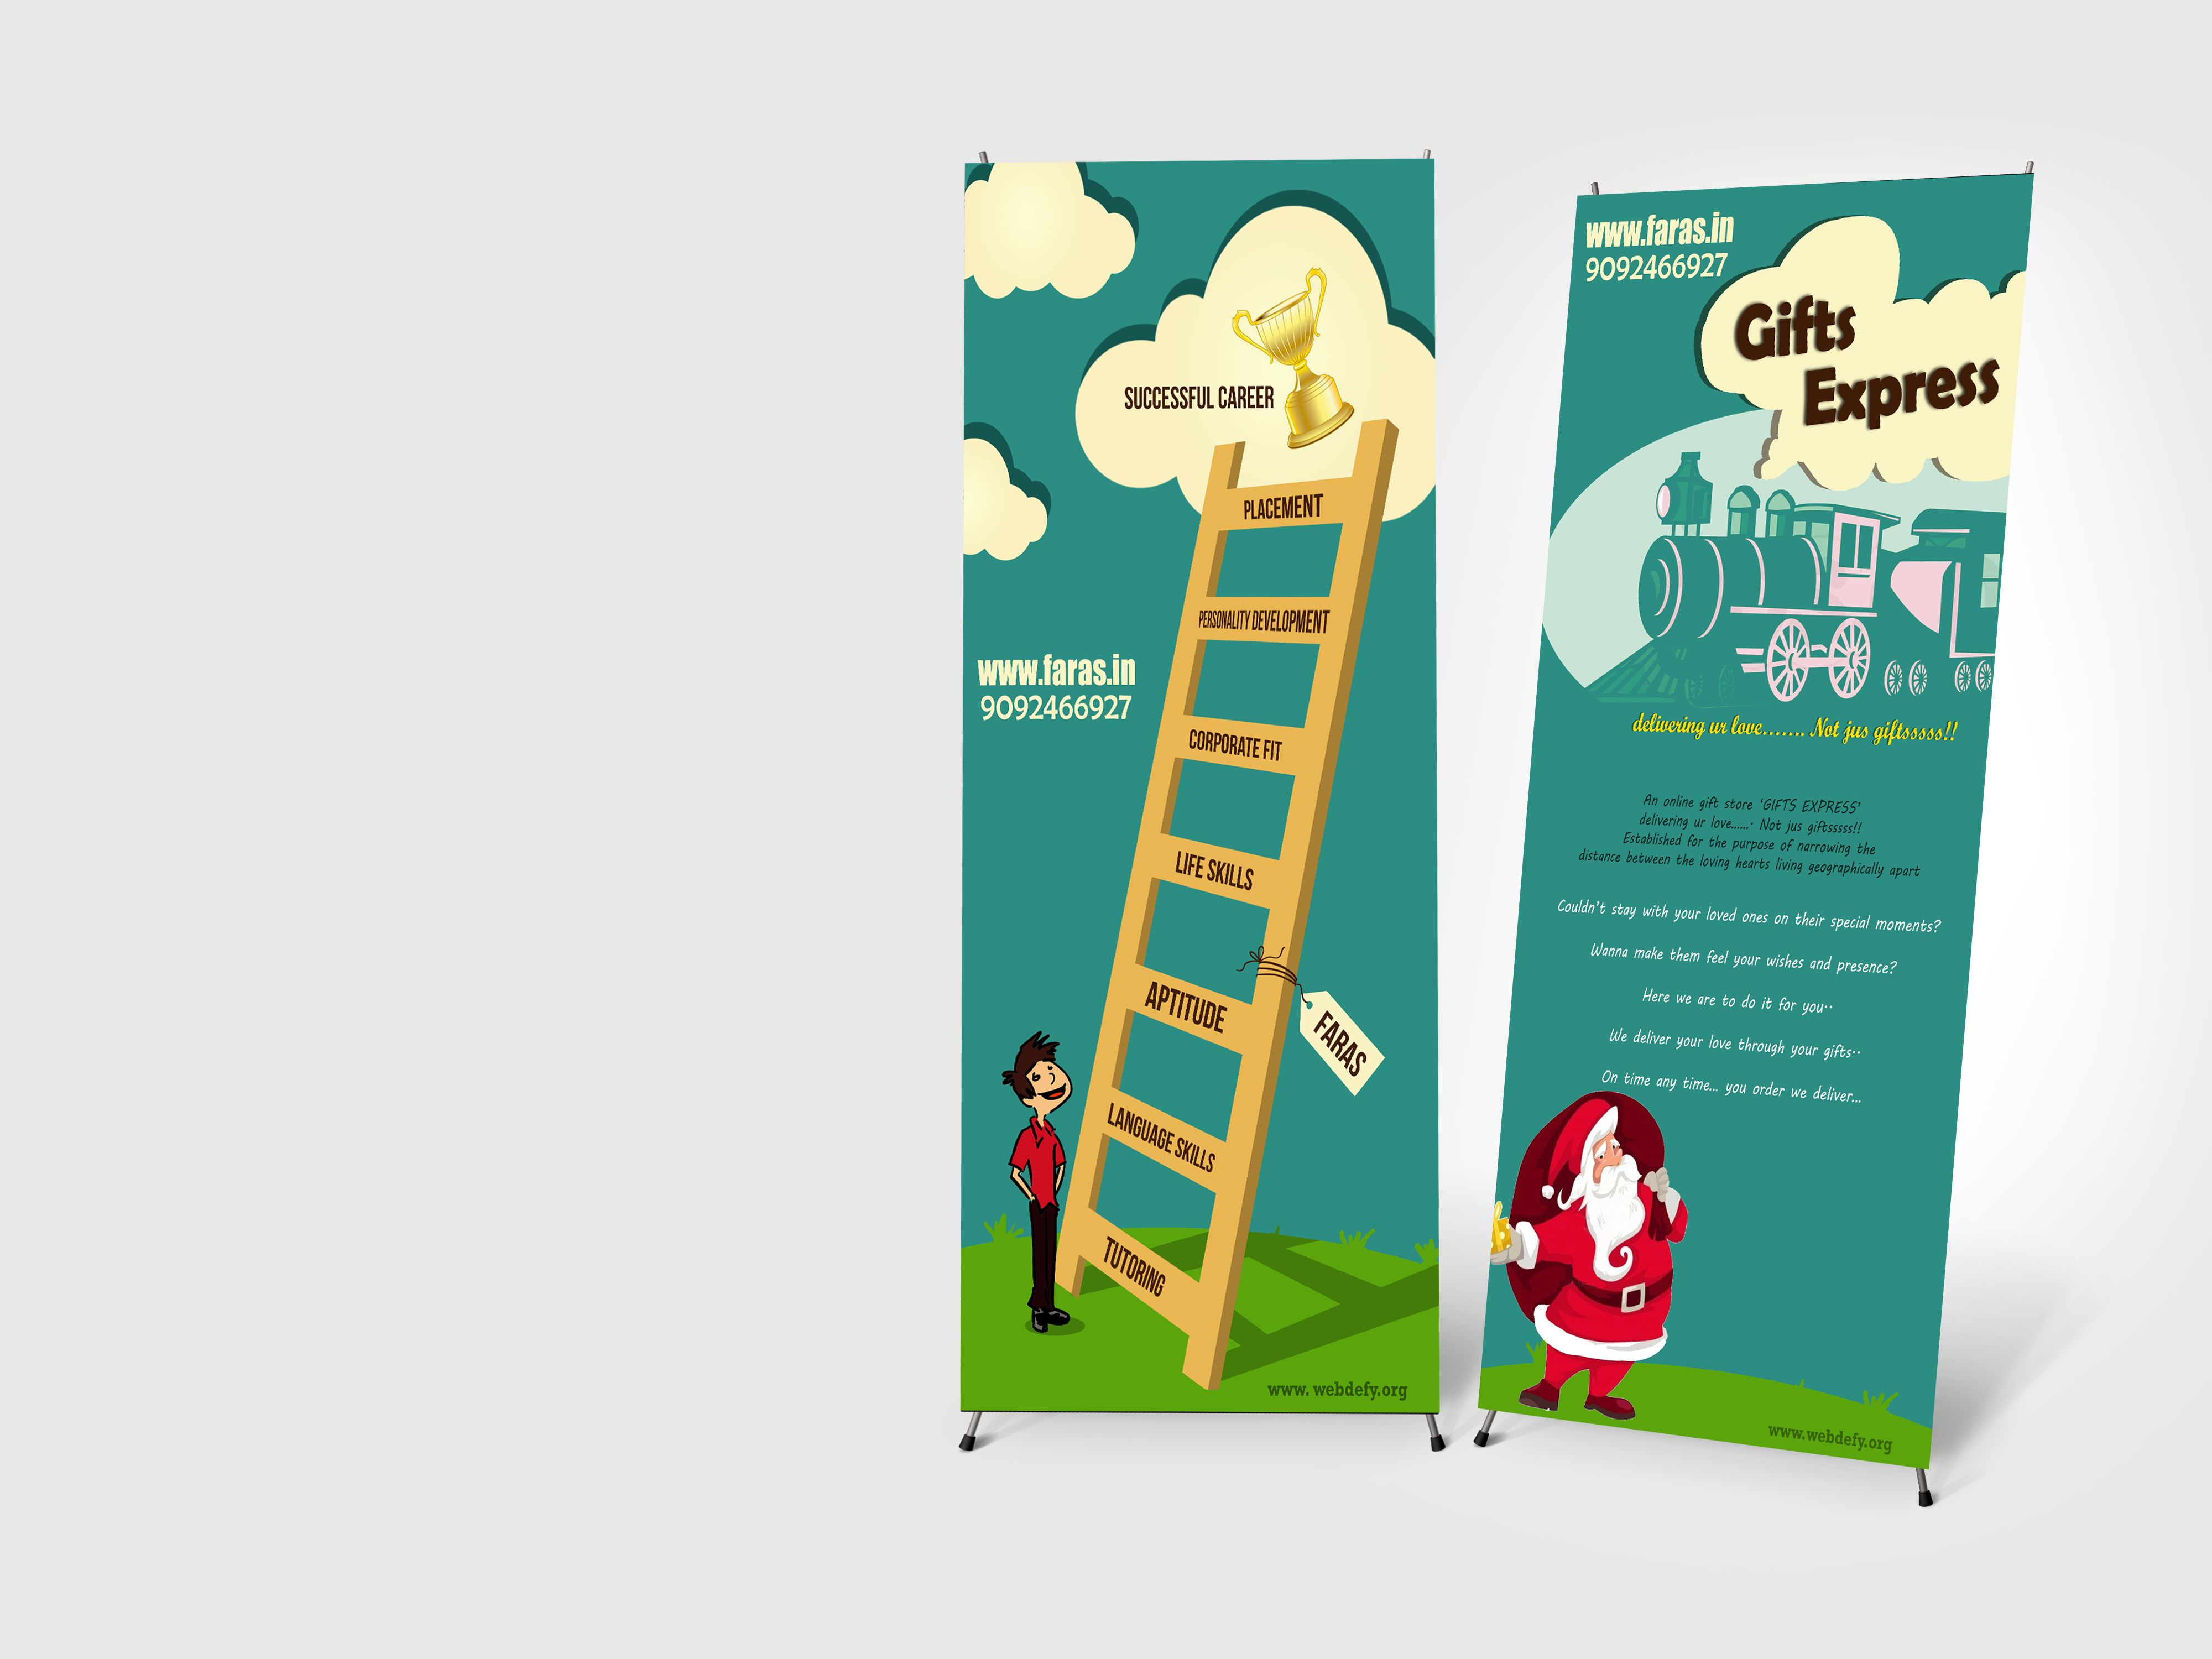 Poster design online - Standee Design For Faras An Online Gift Store Designed By Webdefy